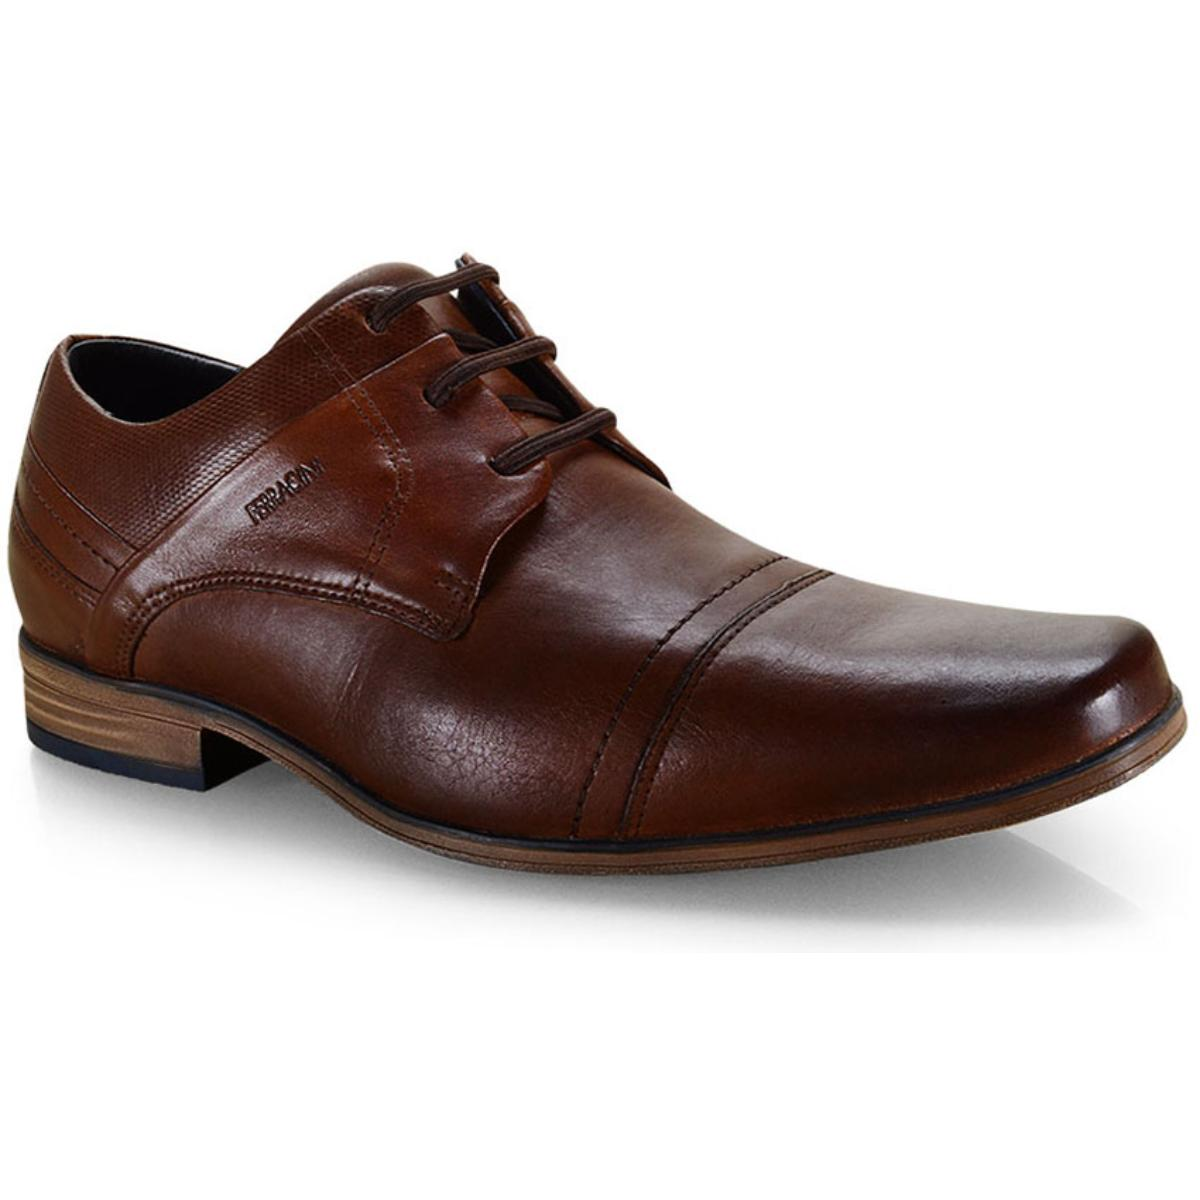 Sapato Masculino Ferracini 6065-575i Havana